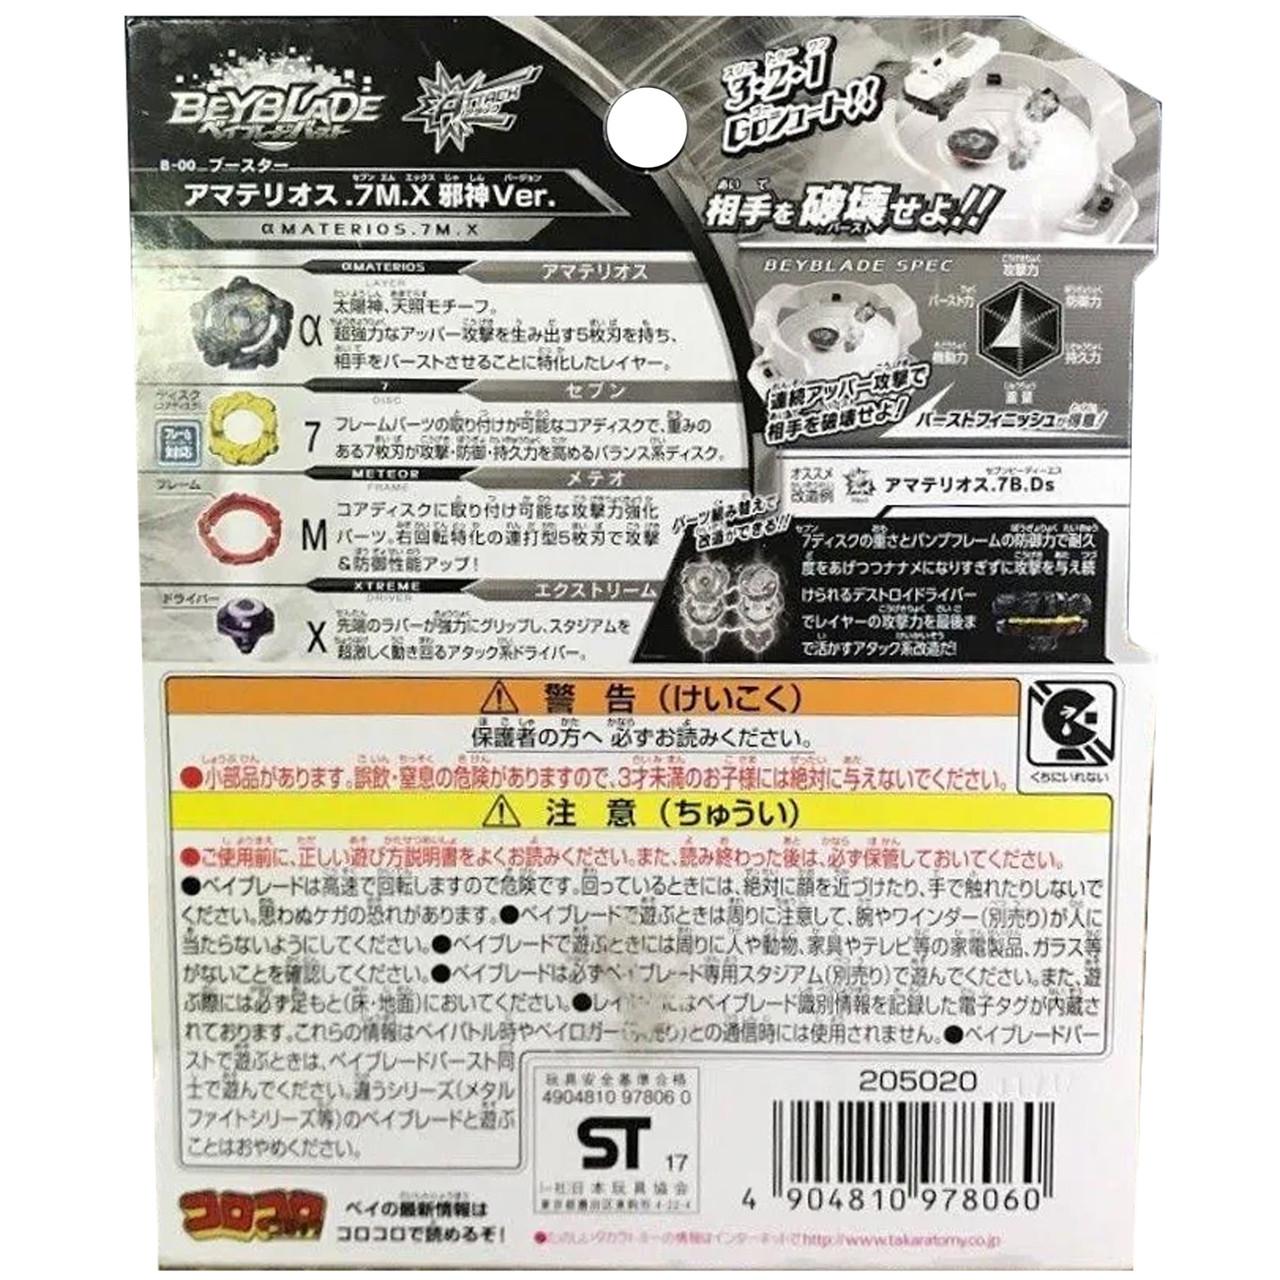 TAKARA TOMY Beyblade BURST B-00 WBBA Limited Amaterios.7M.X ThePortal0